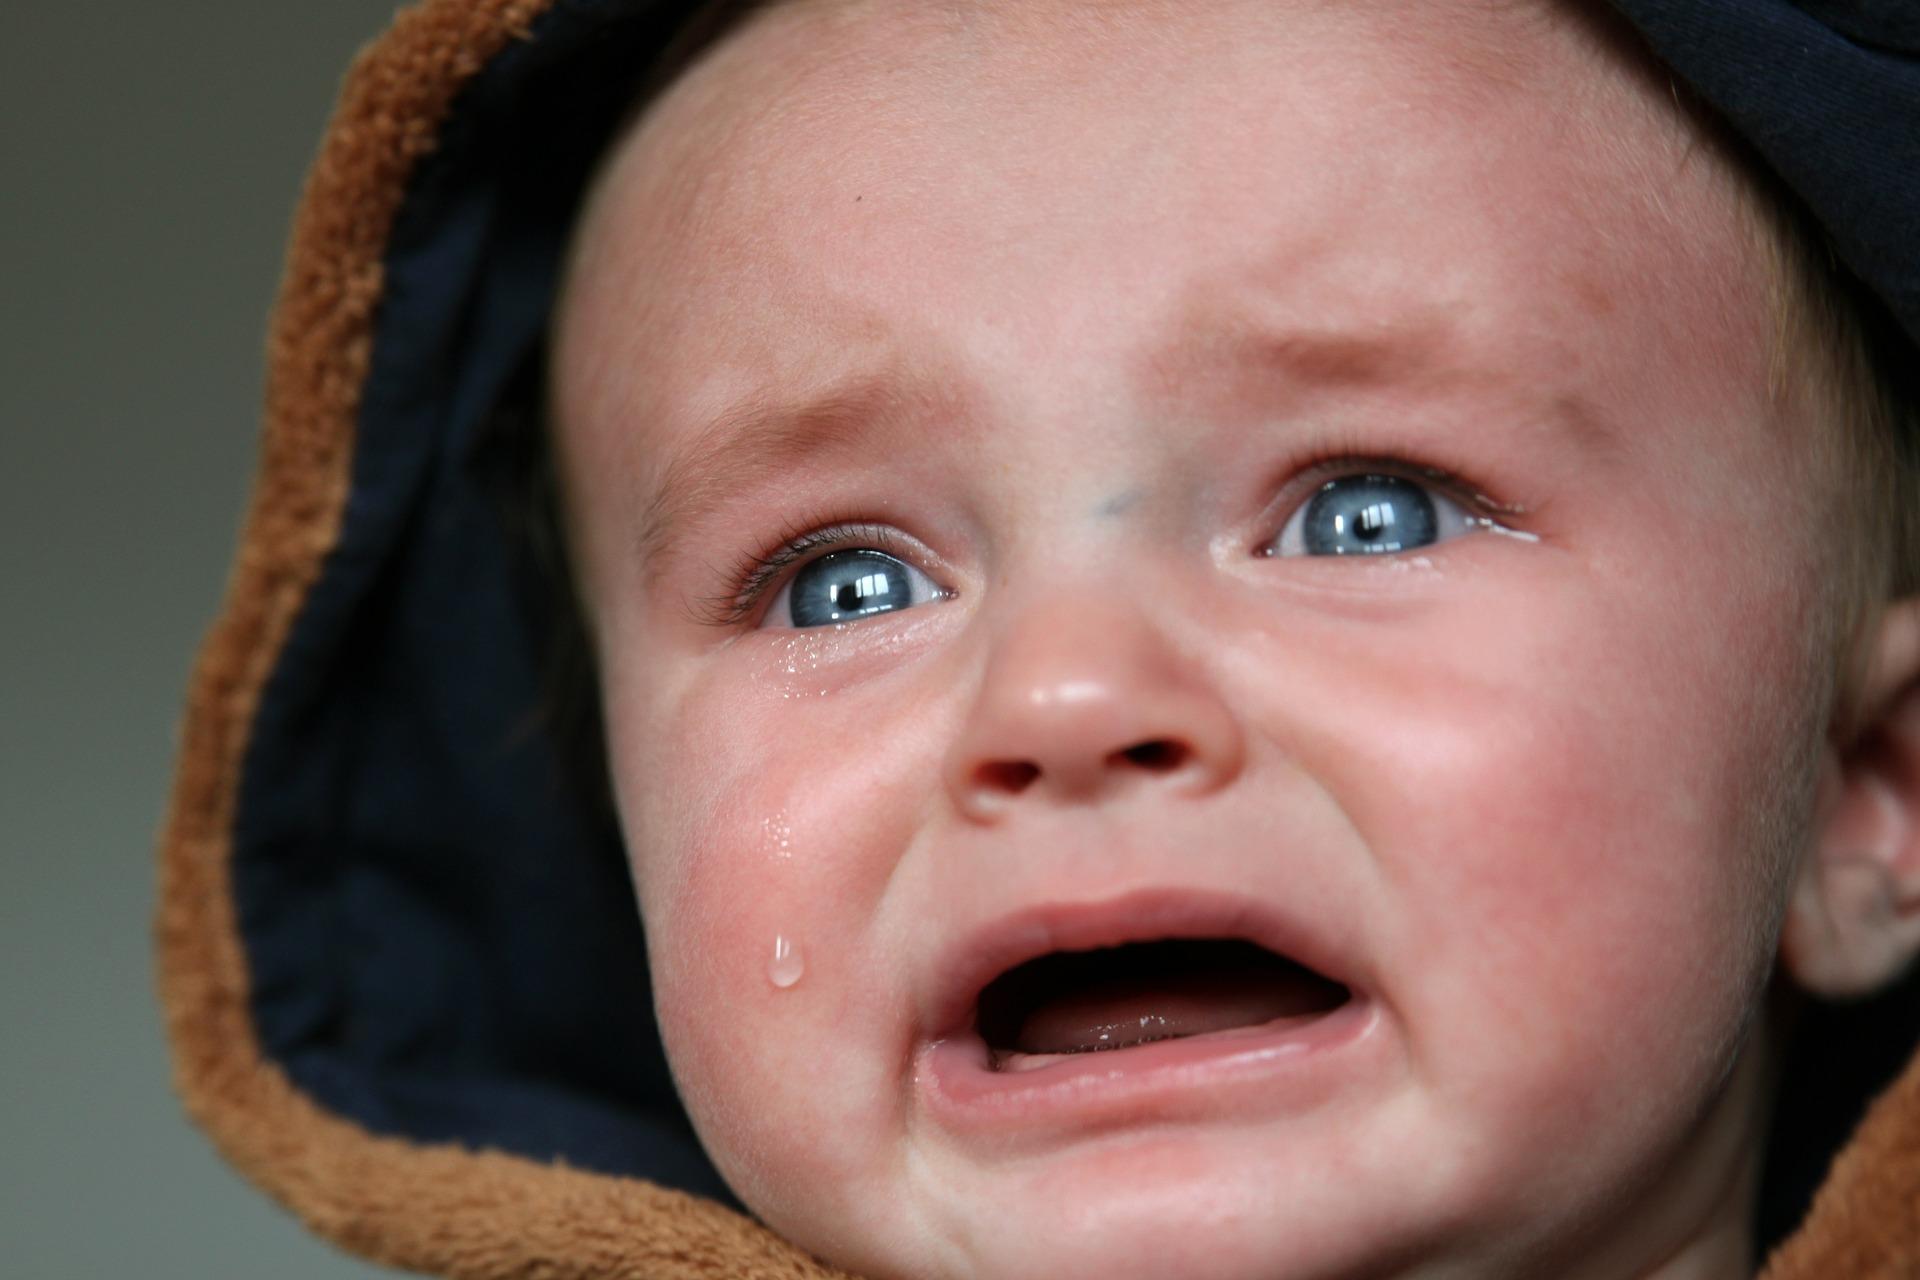 emotional baby